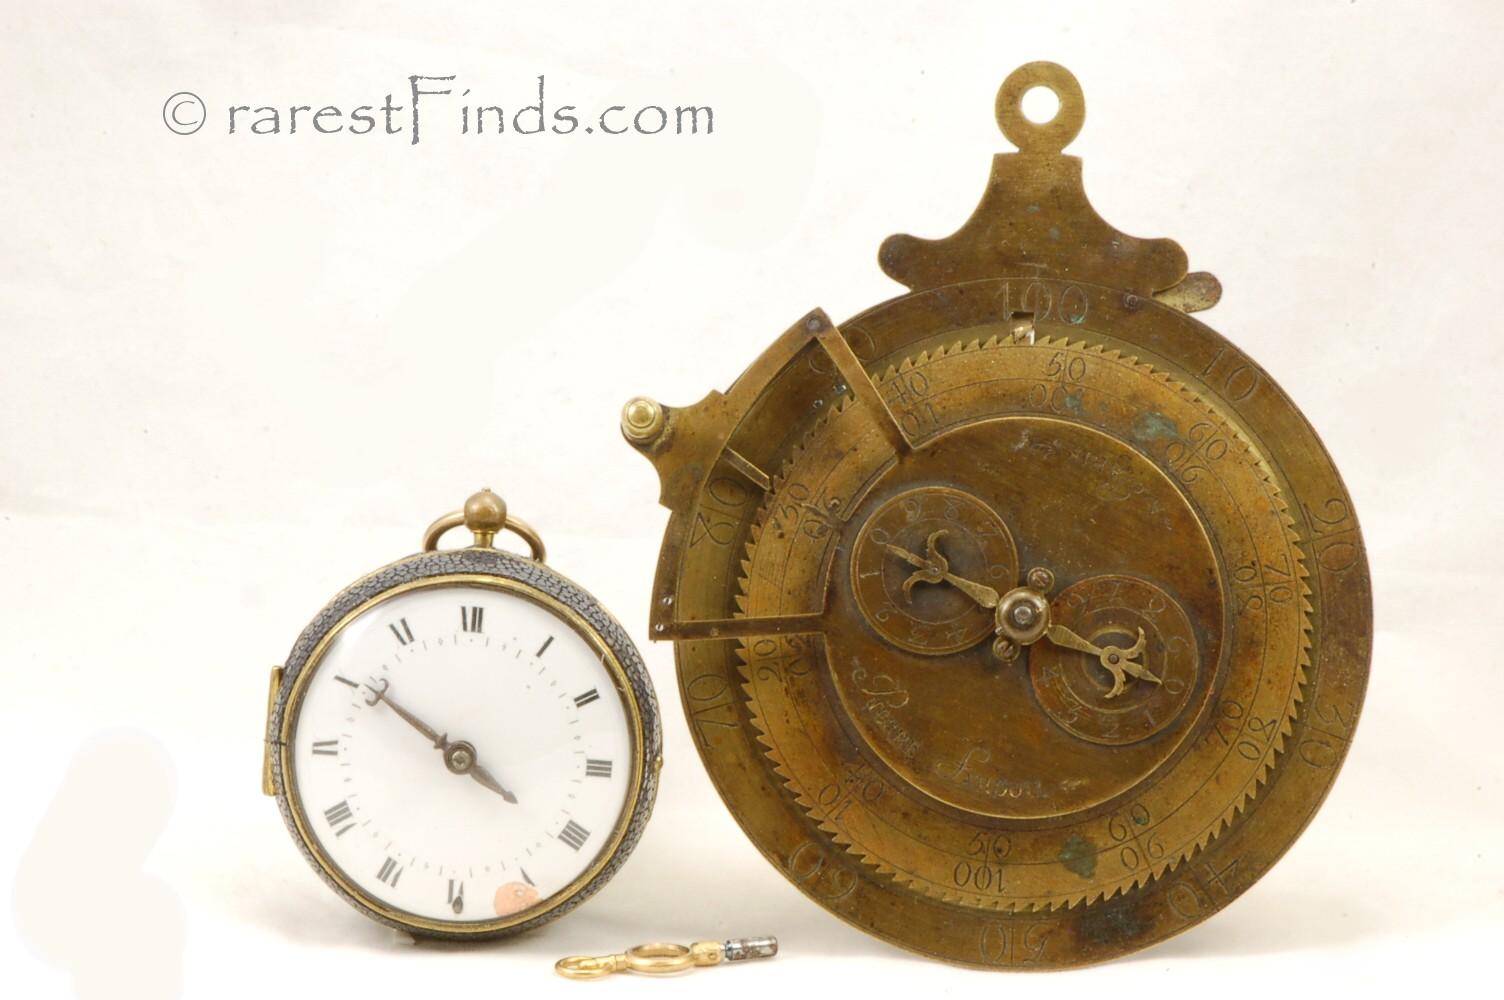 Pierre-Fardoil-Calculator-and-Pocket-Watch-c.1700